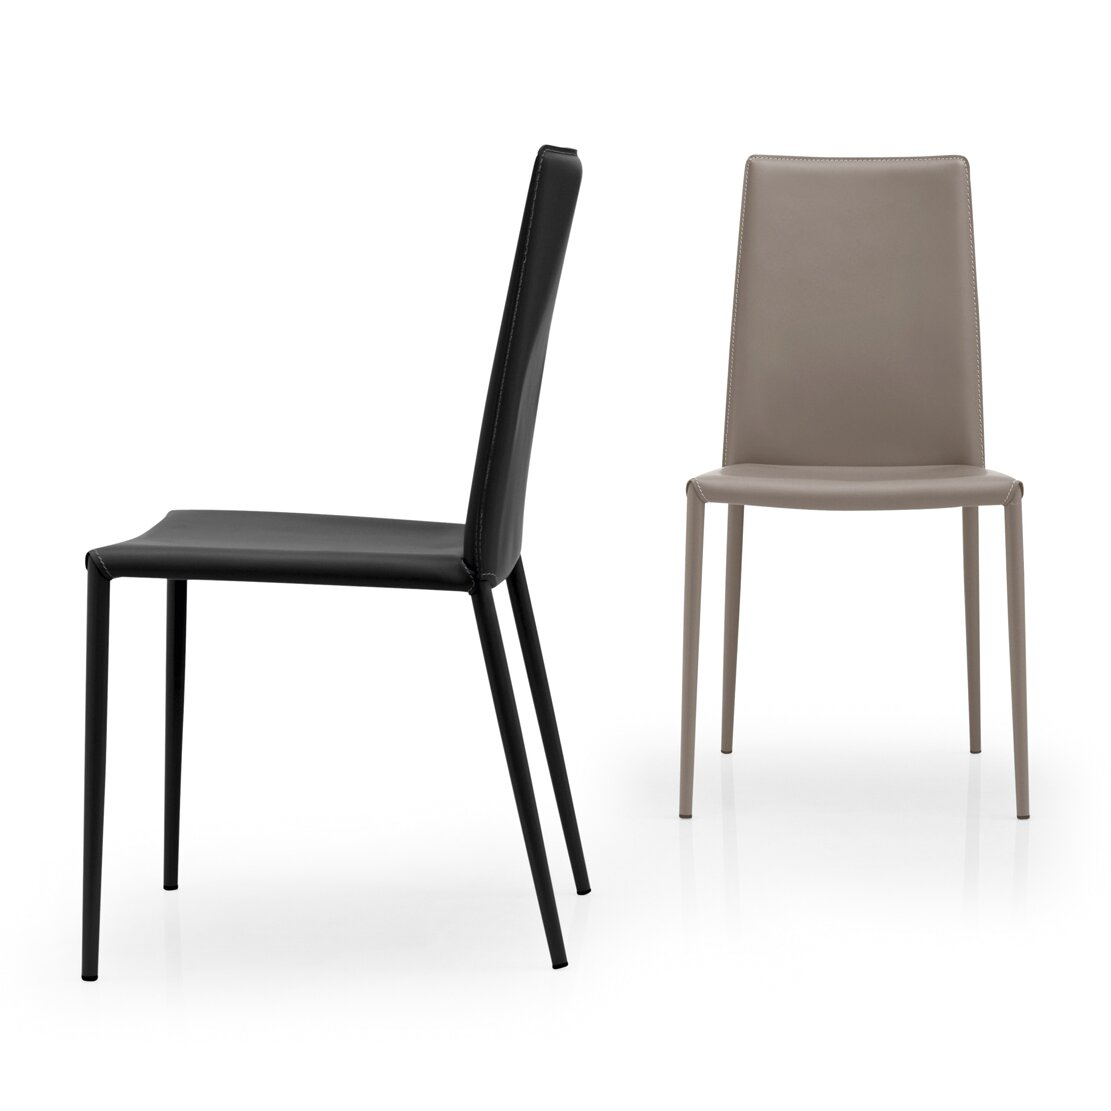 calligaris boheme side chair reviews wayfair. Black Bedroom Furniture Sets. Home Design Ideas